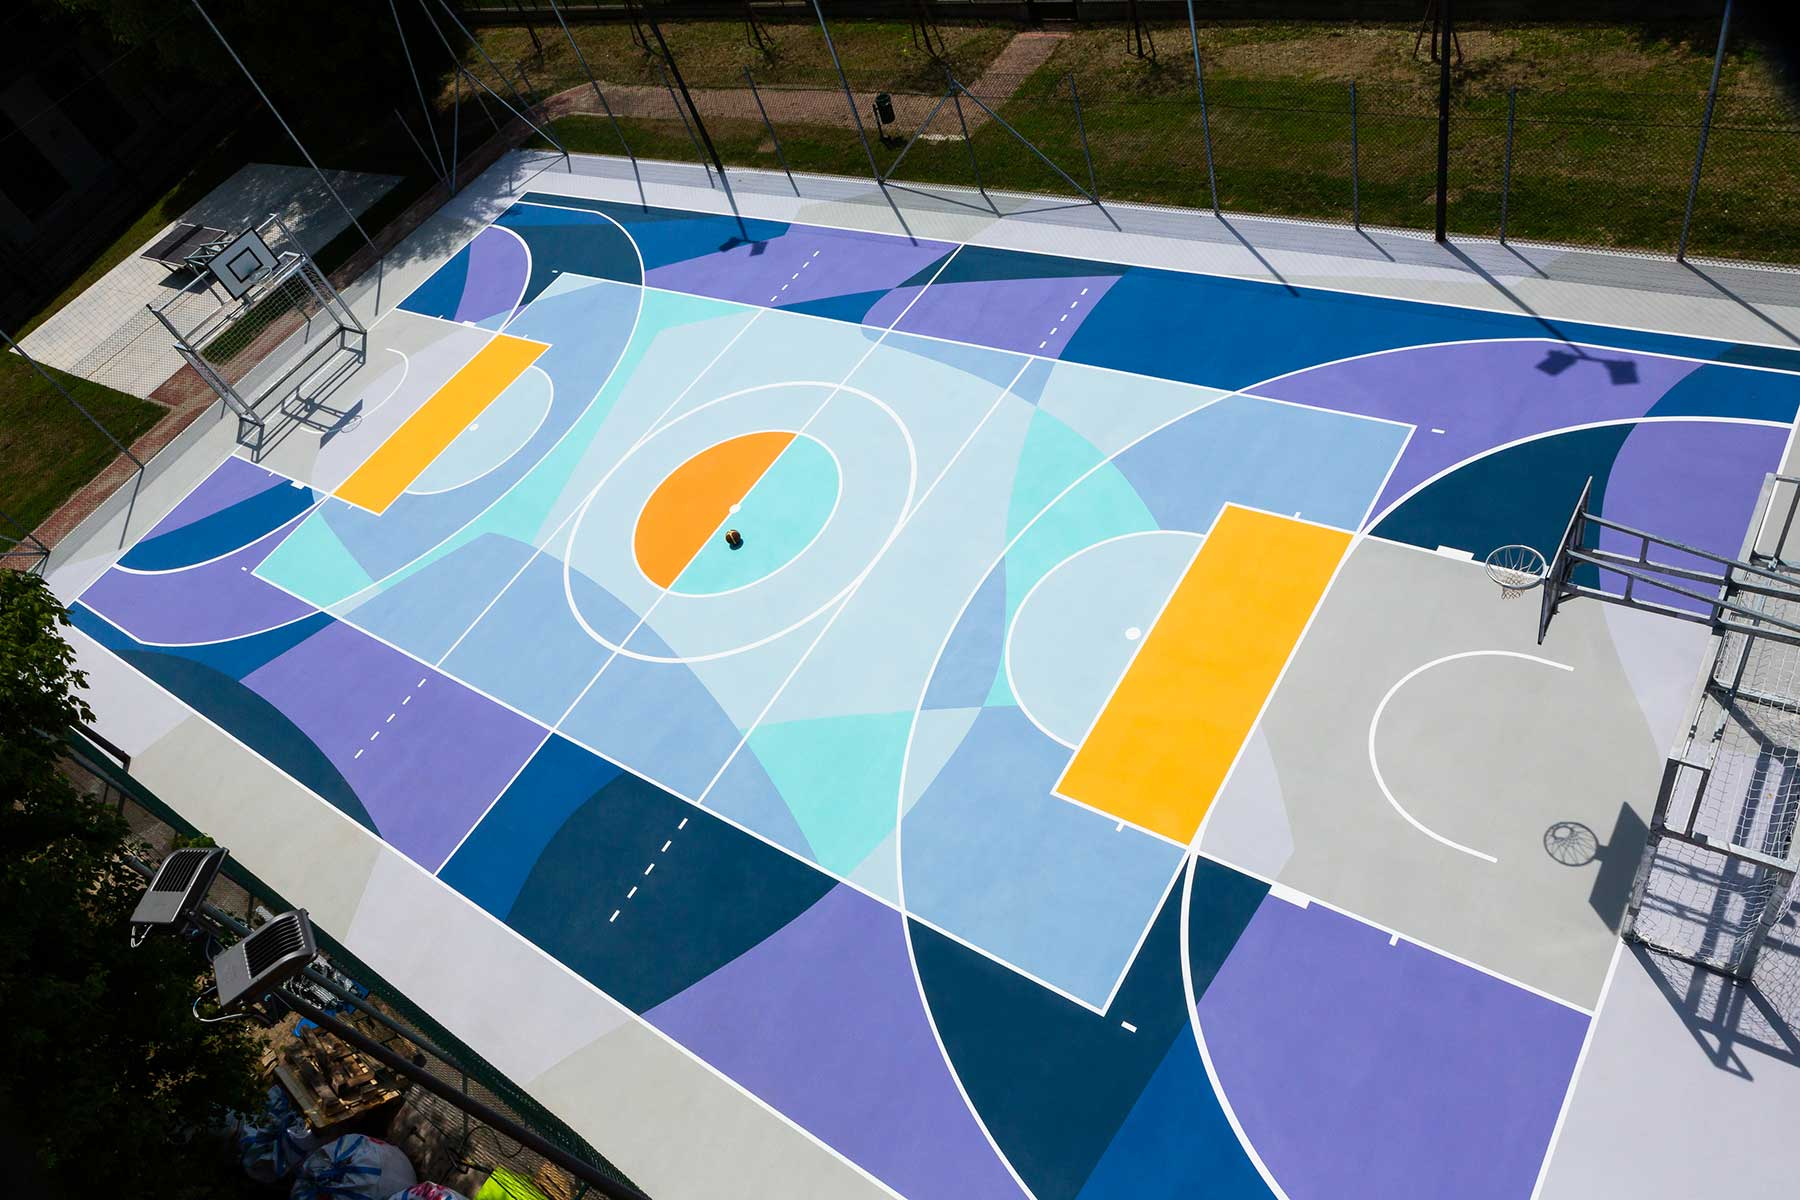 Farbenfrohe Basketballplätze von Gummy Gue Gummy-Gue-bunter-basketballplatz-Buccinasco_06